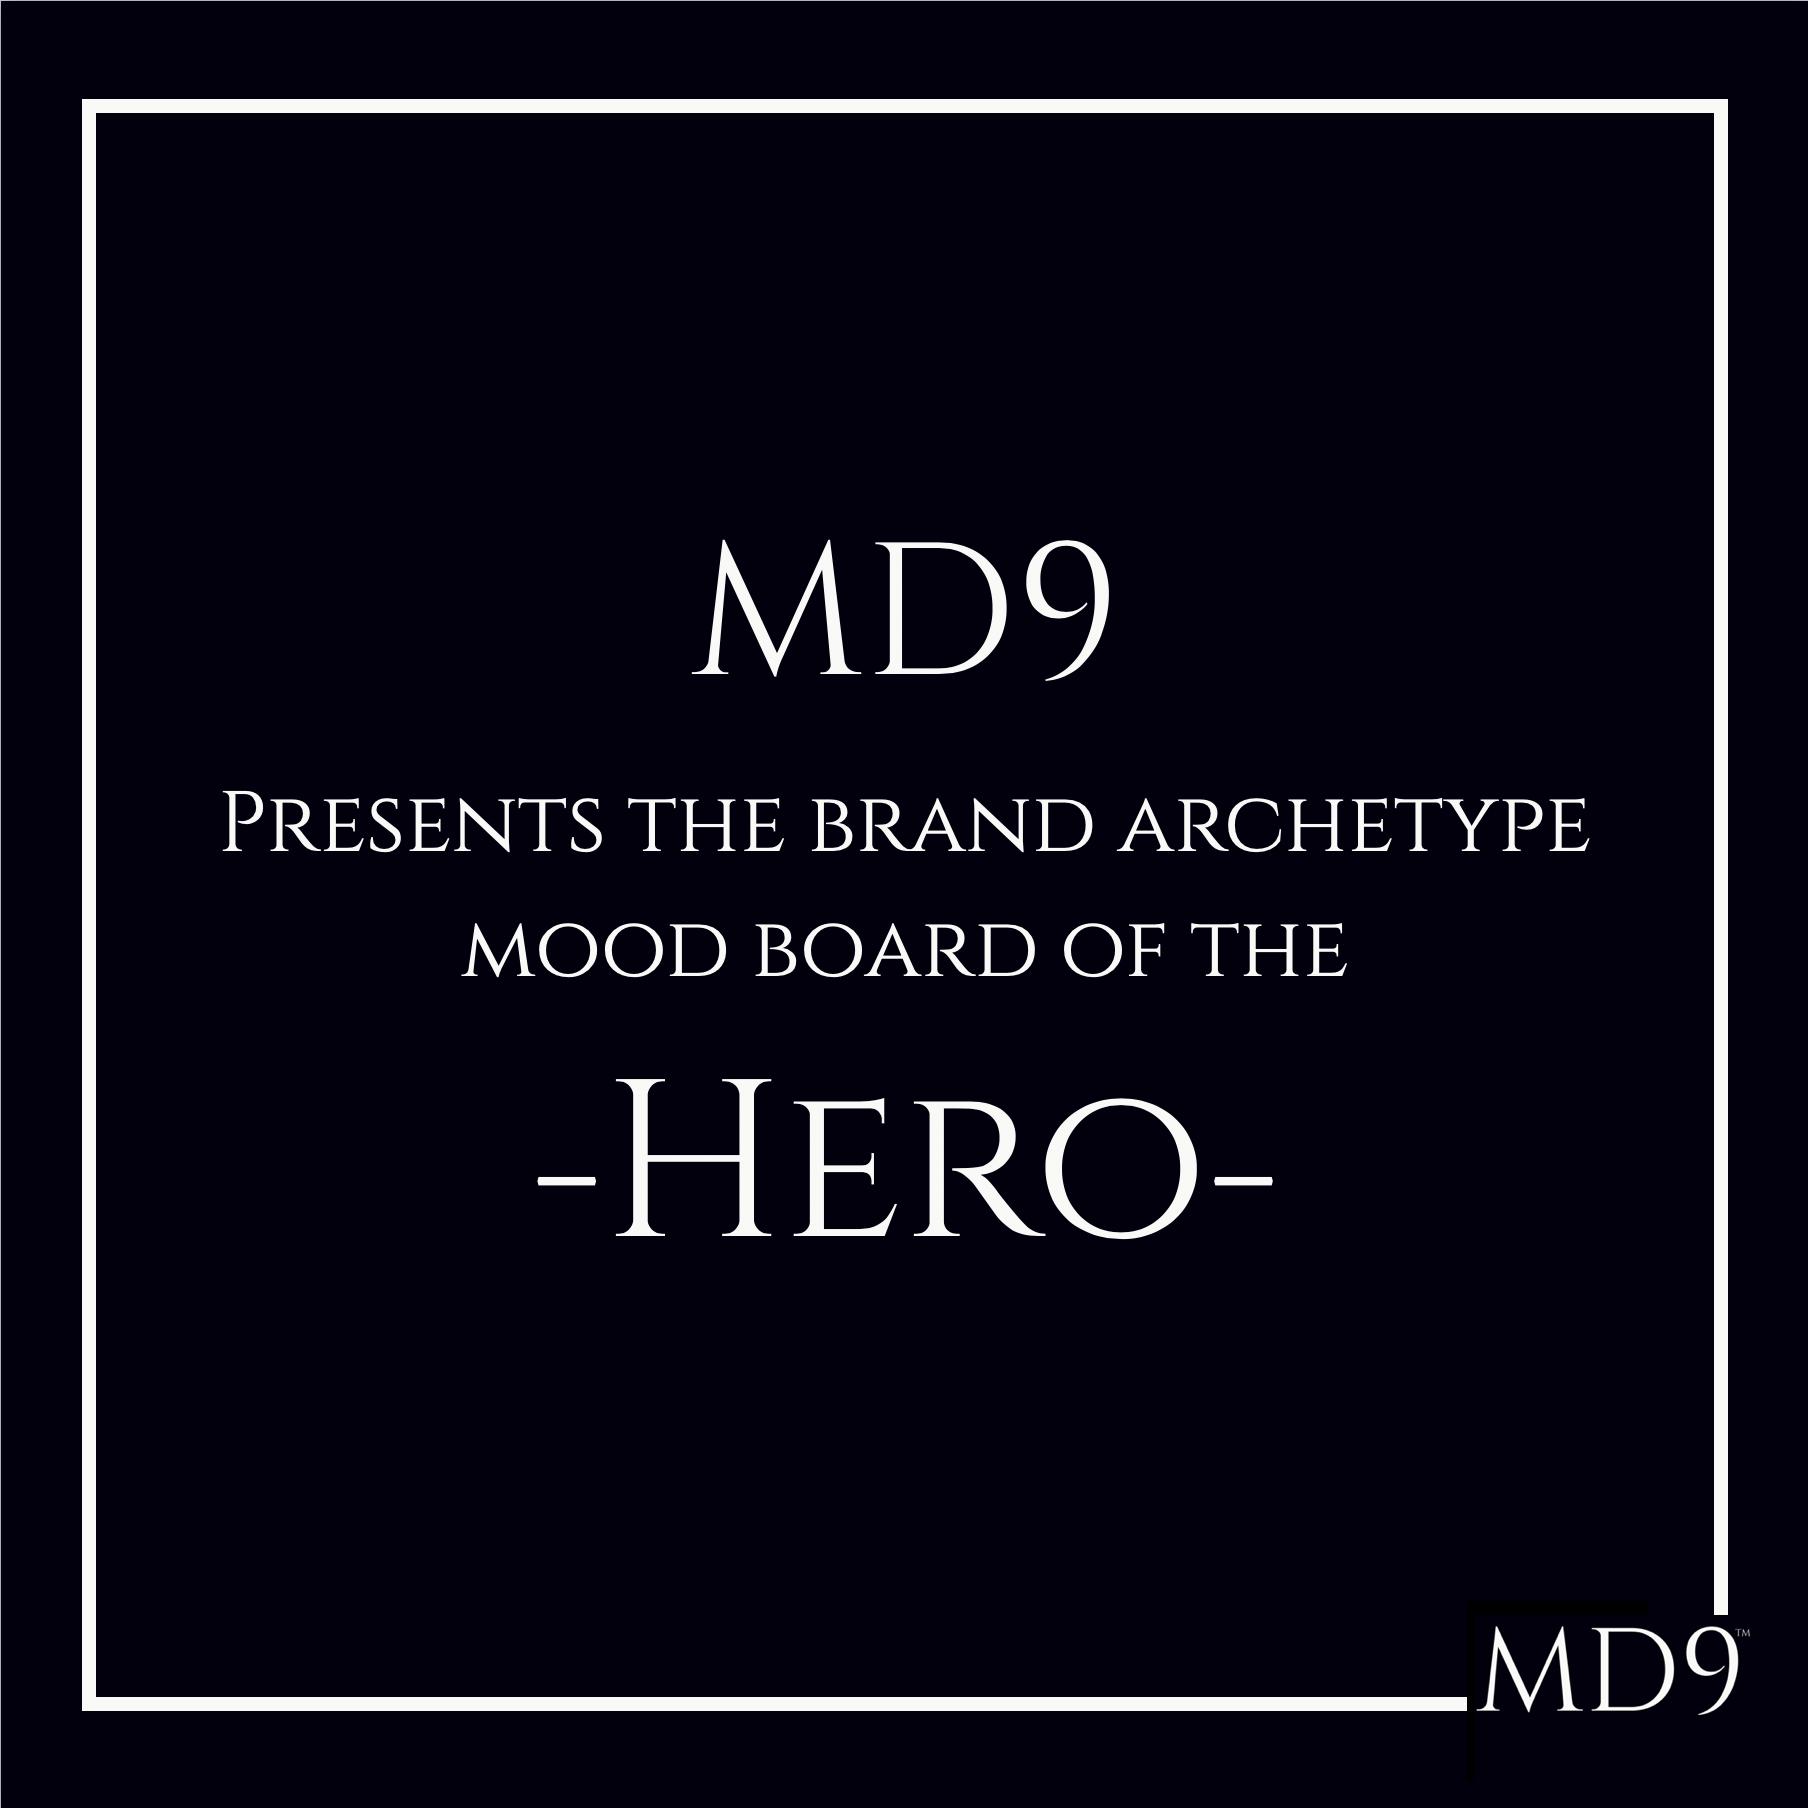 MD9's Brand Archetype Mood Board – Hero